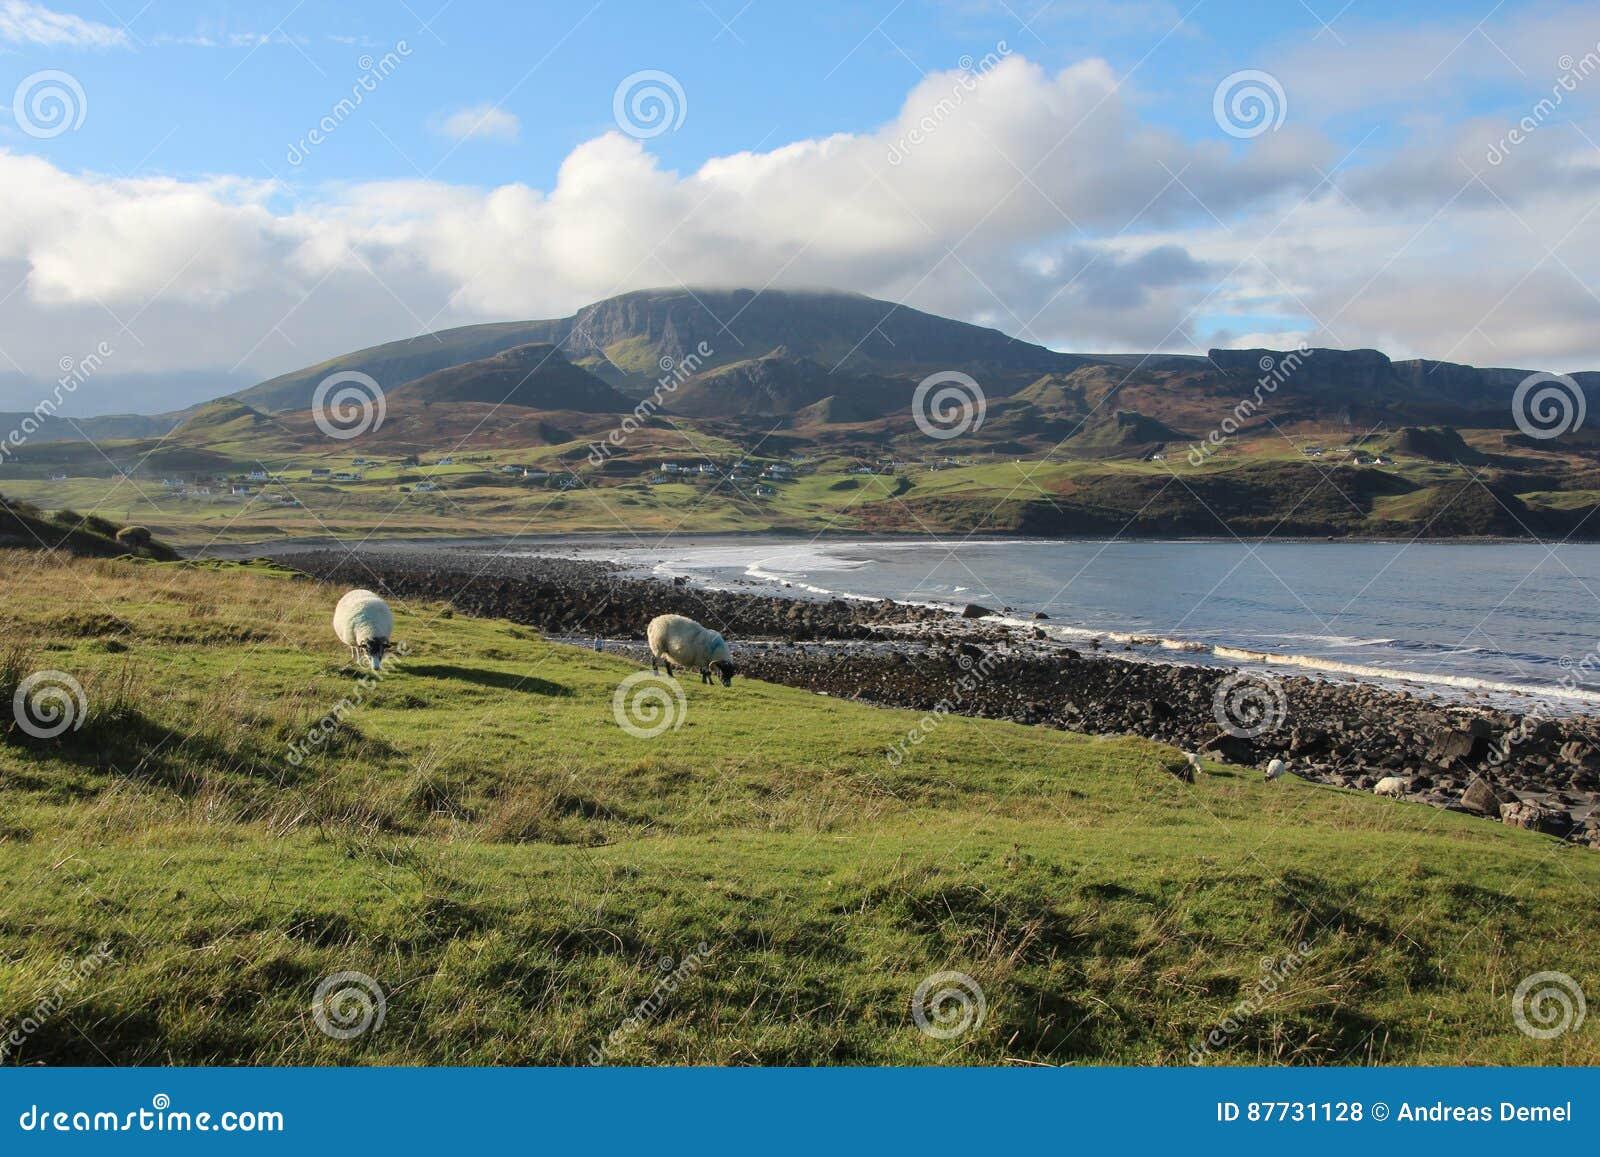 Download Landscape on Isle of Skye stock photo. Image of landscape - 87731128